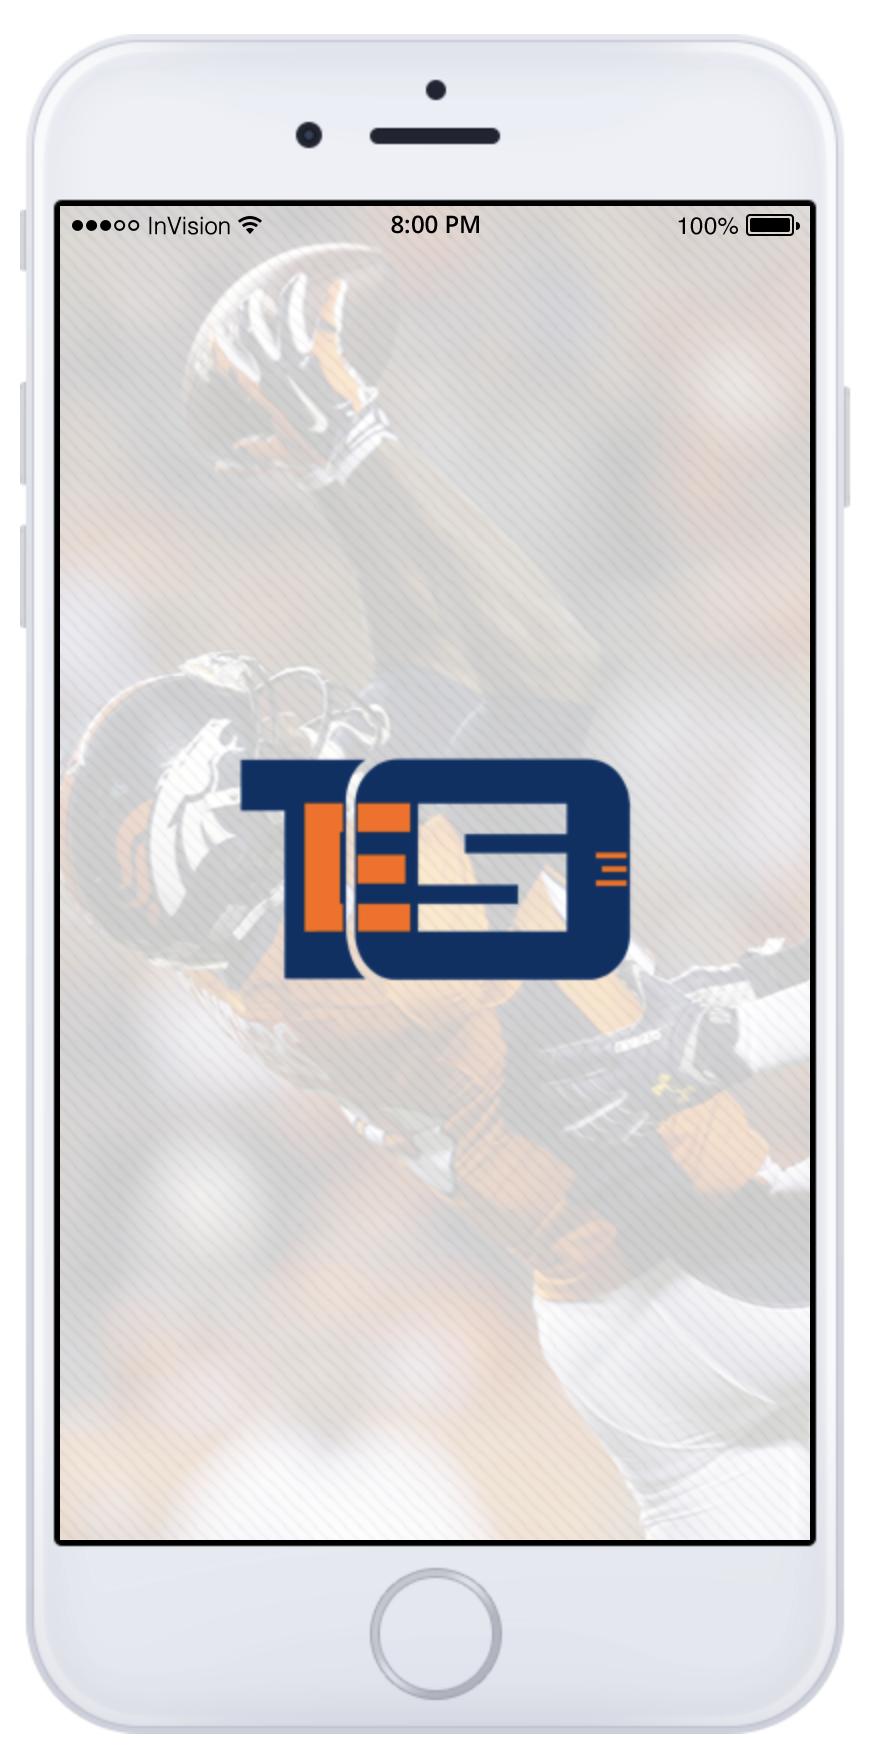 Emmanuel Sanders Mobile App Confirm Payment Screen